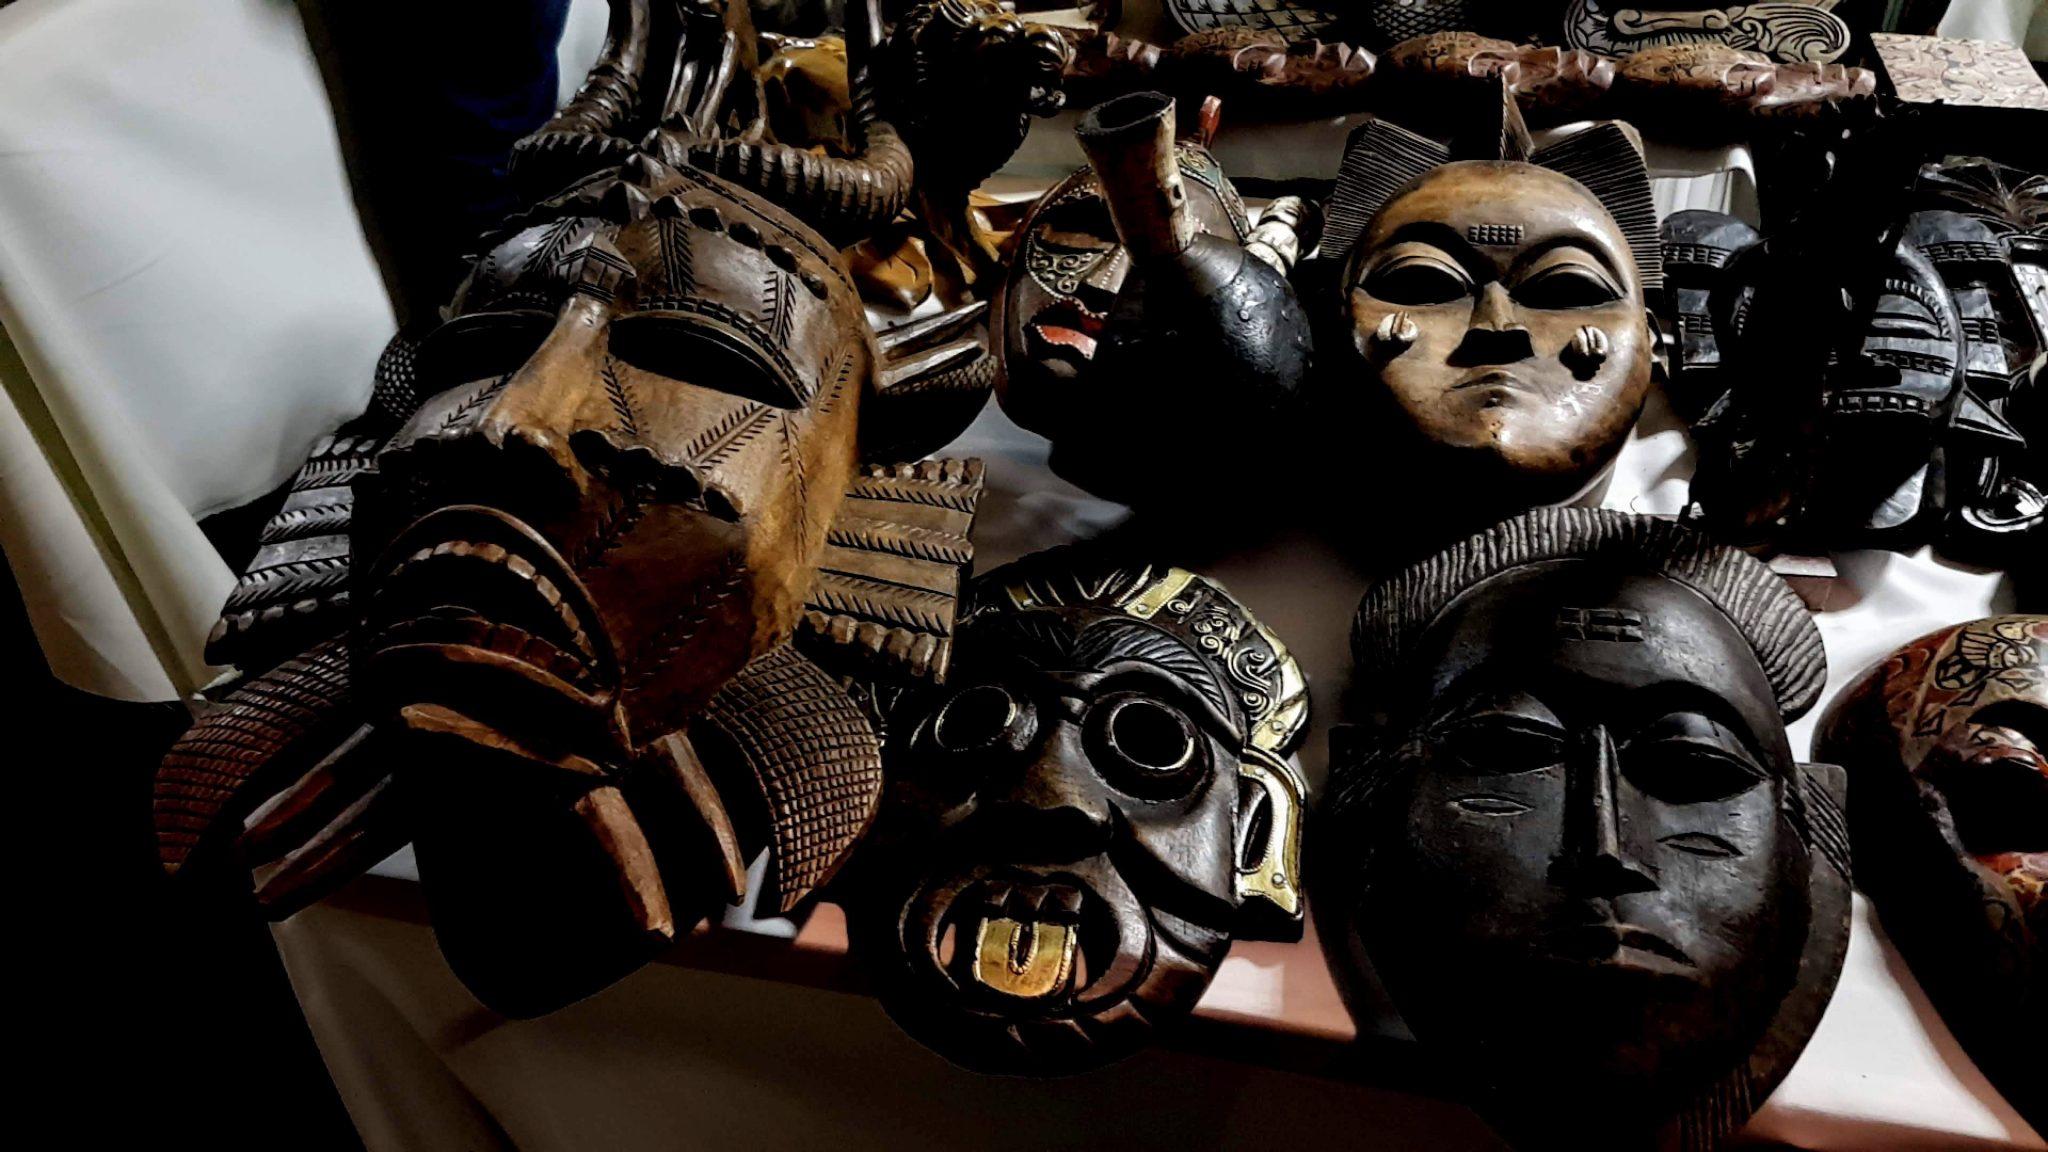 Scary masks for no reason